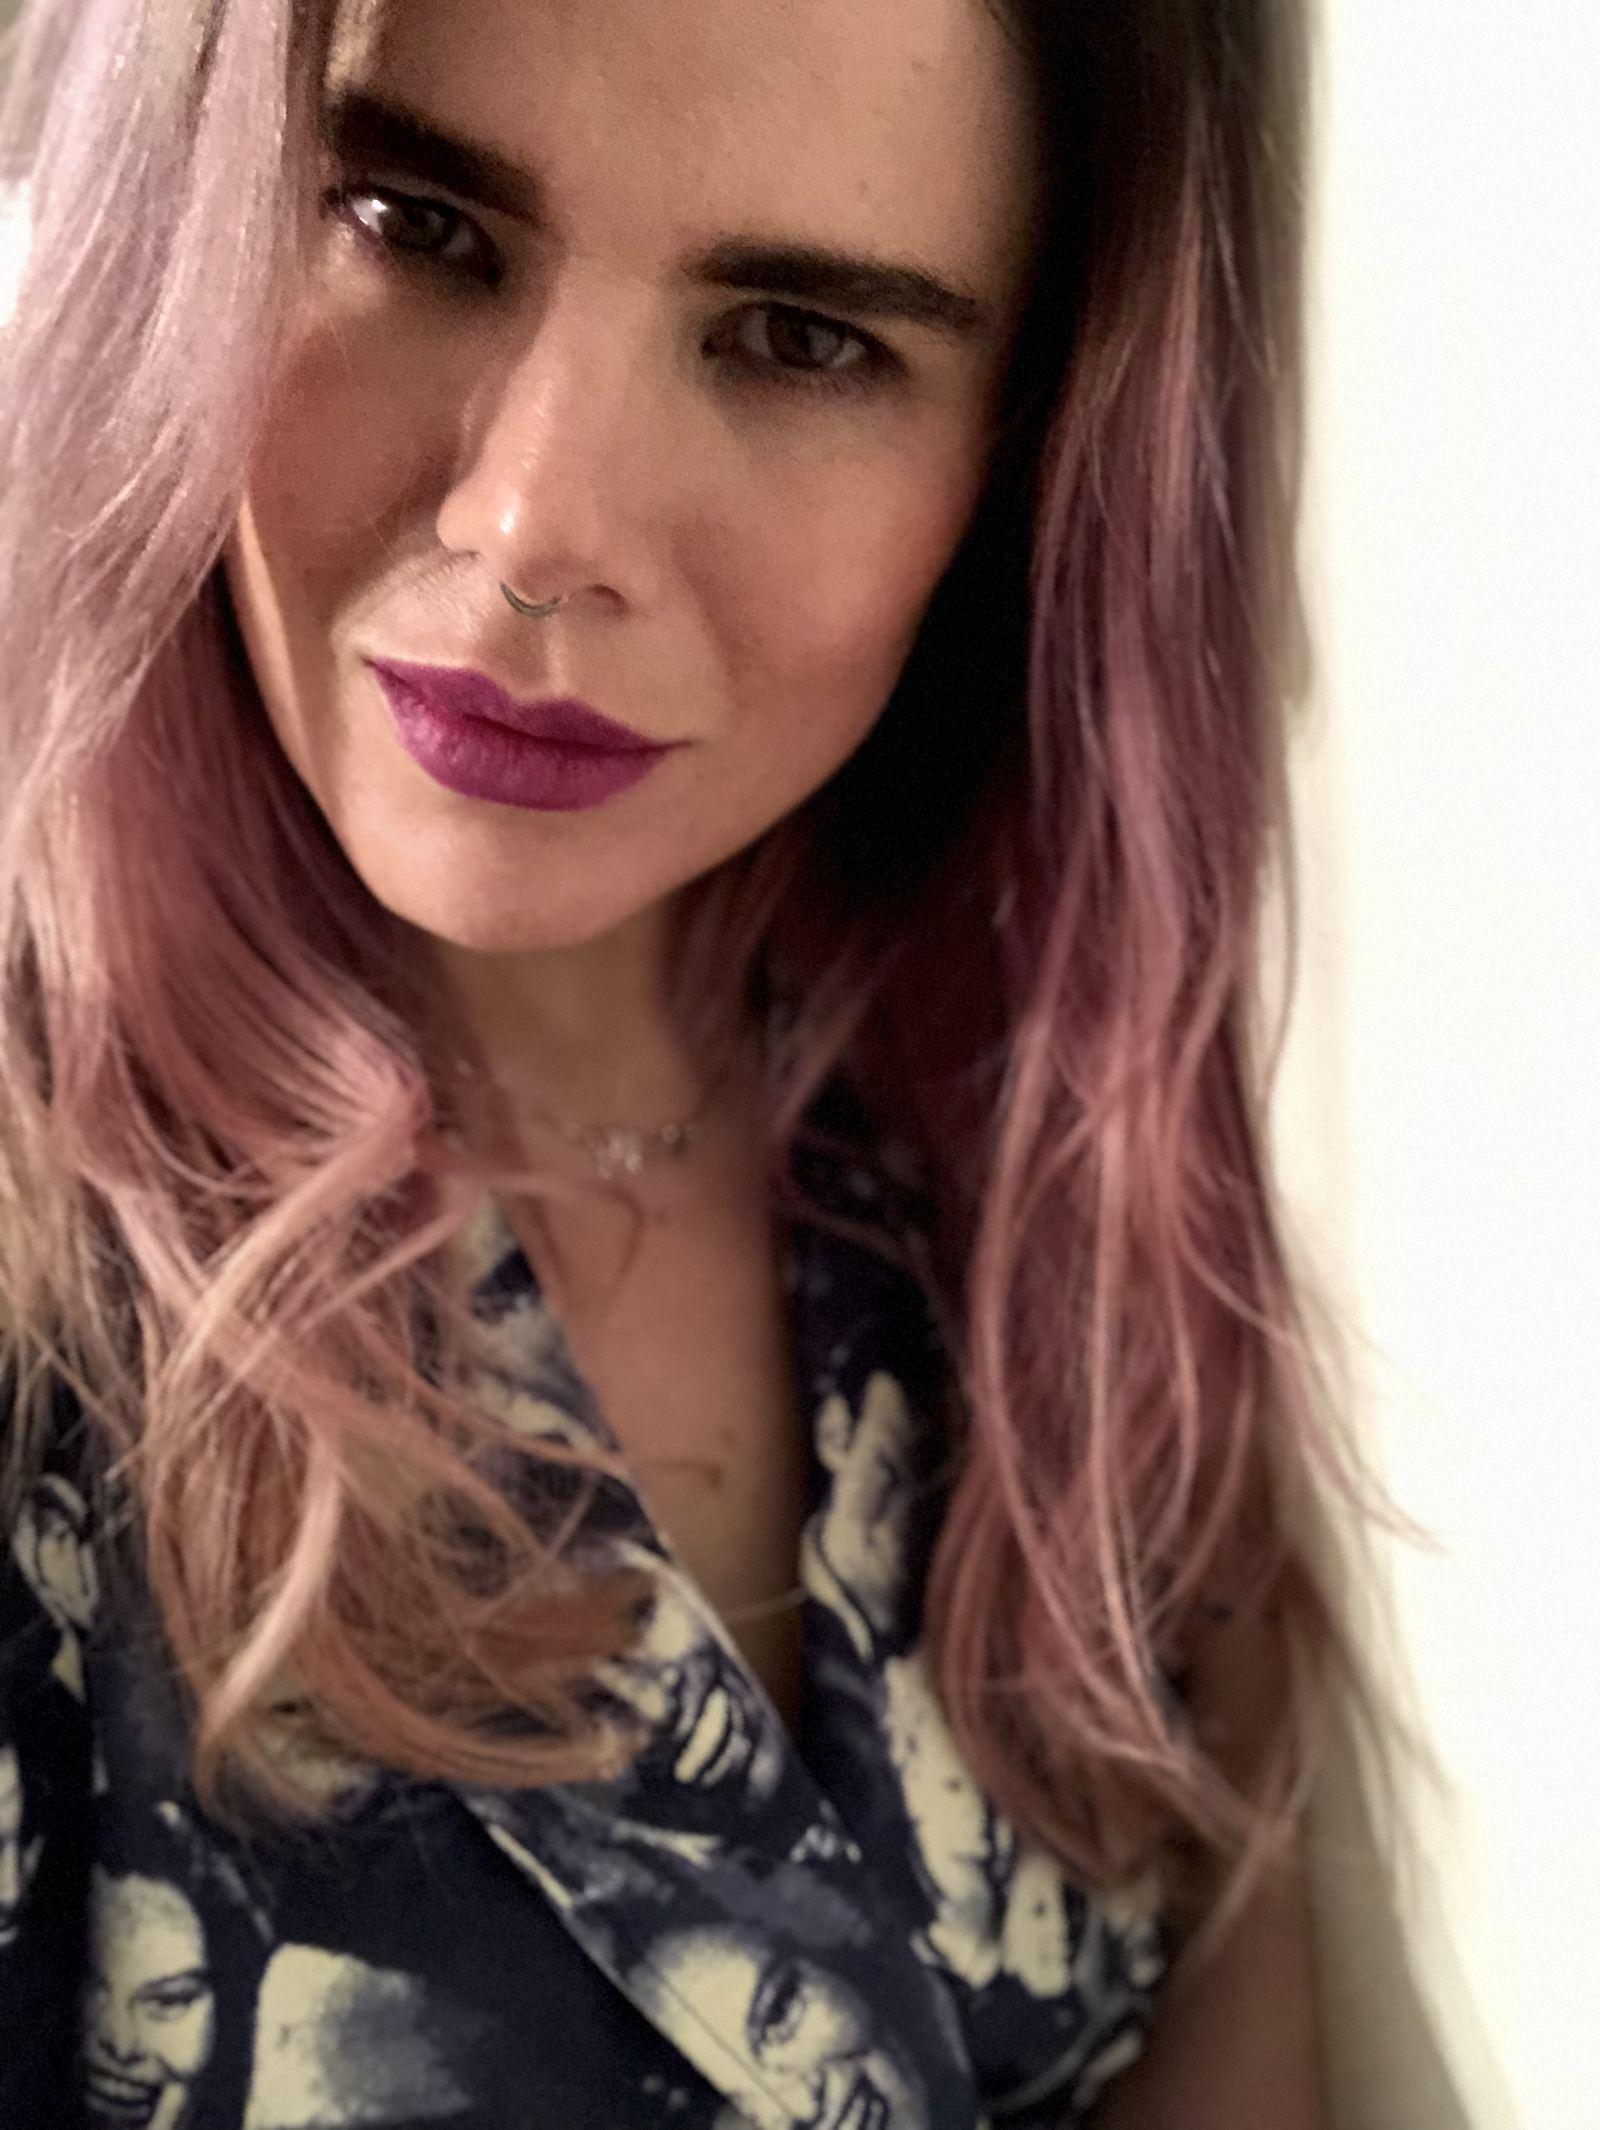 Headshot of Blogger Pixie Tenenbaum wearing vintage Dieter Heupel from Trendlistr, with pink hair and a purple lip